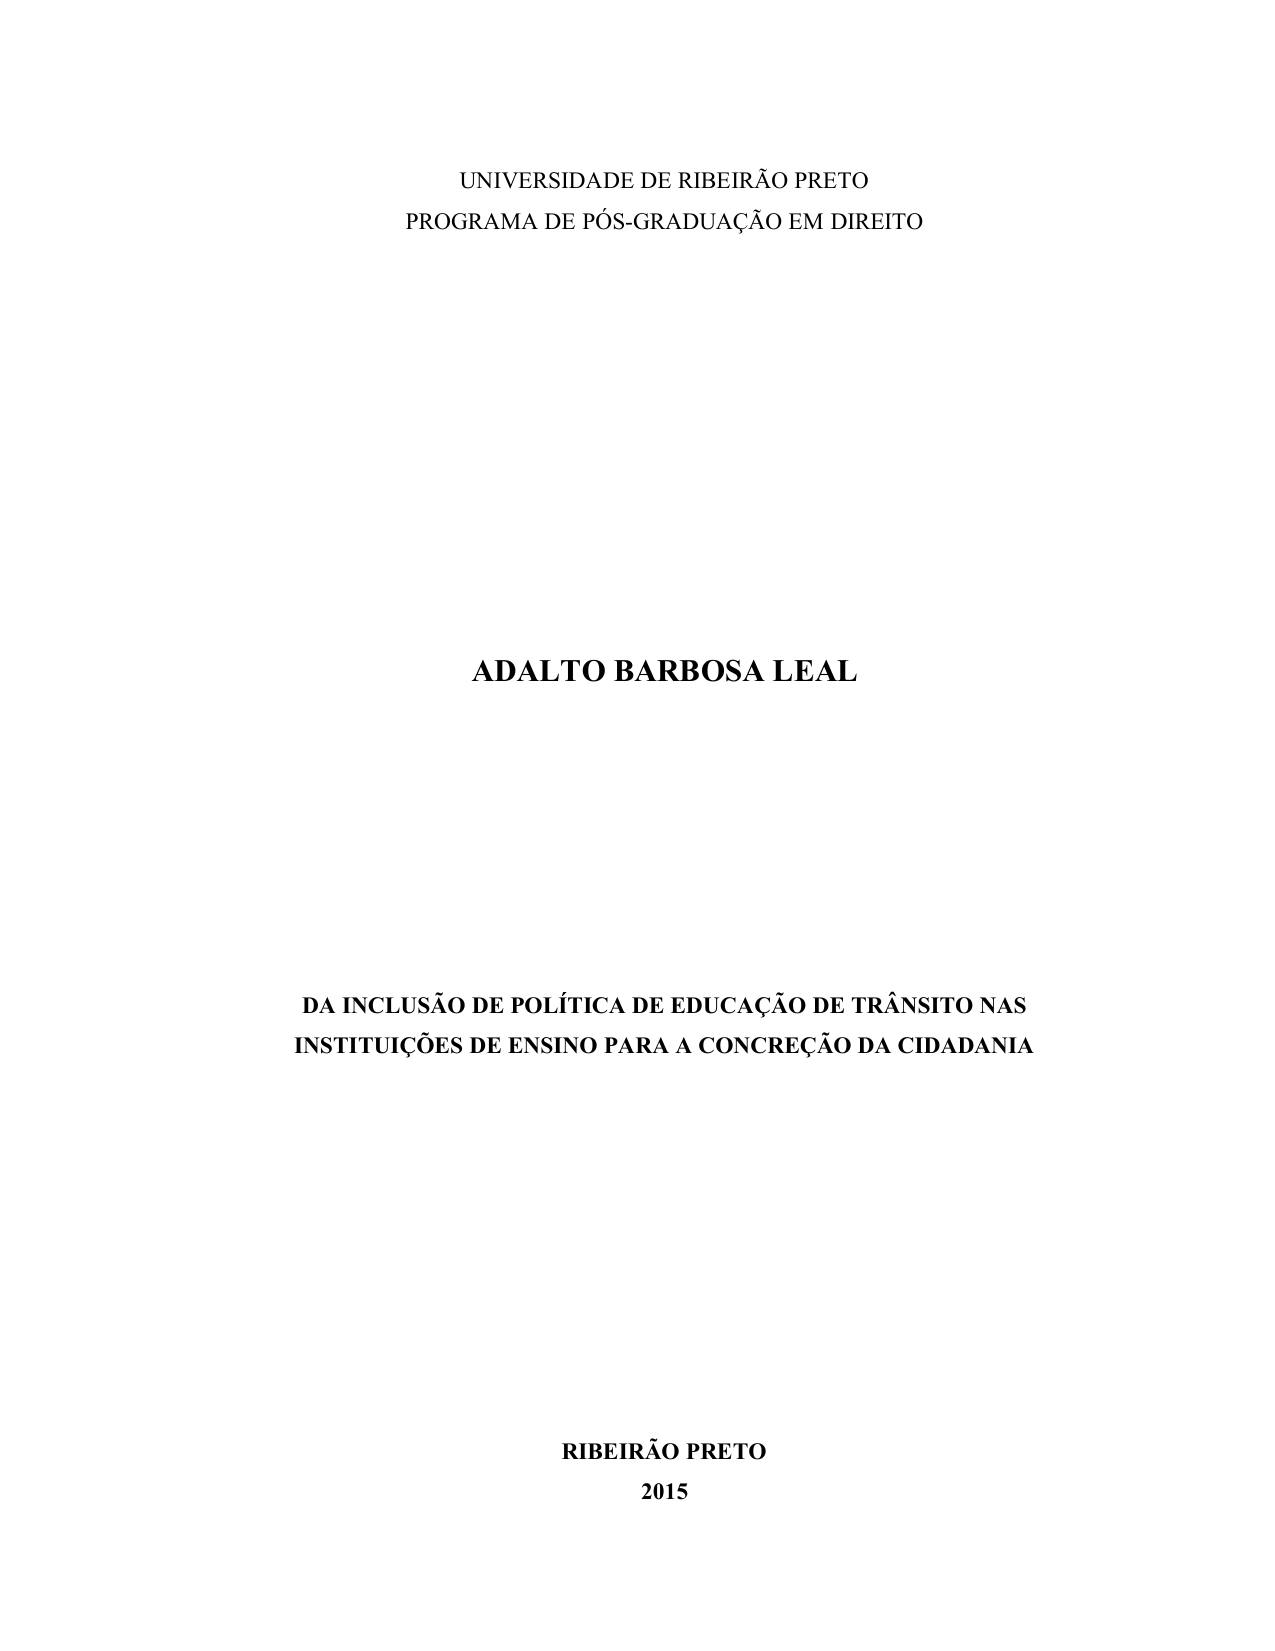 BAIXAR LDB 9394/96 PARA